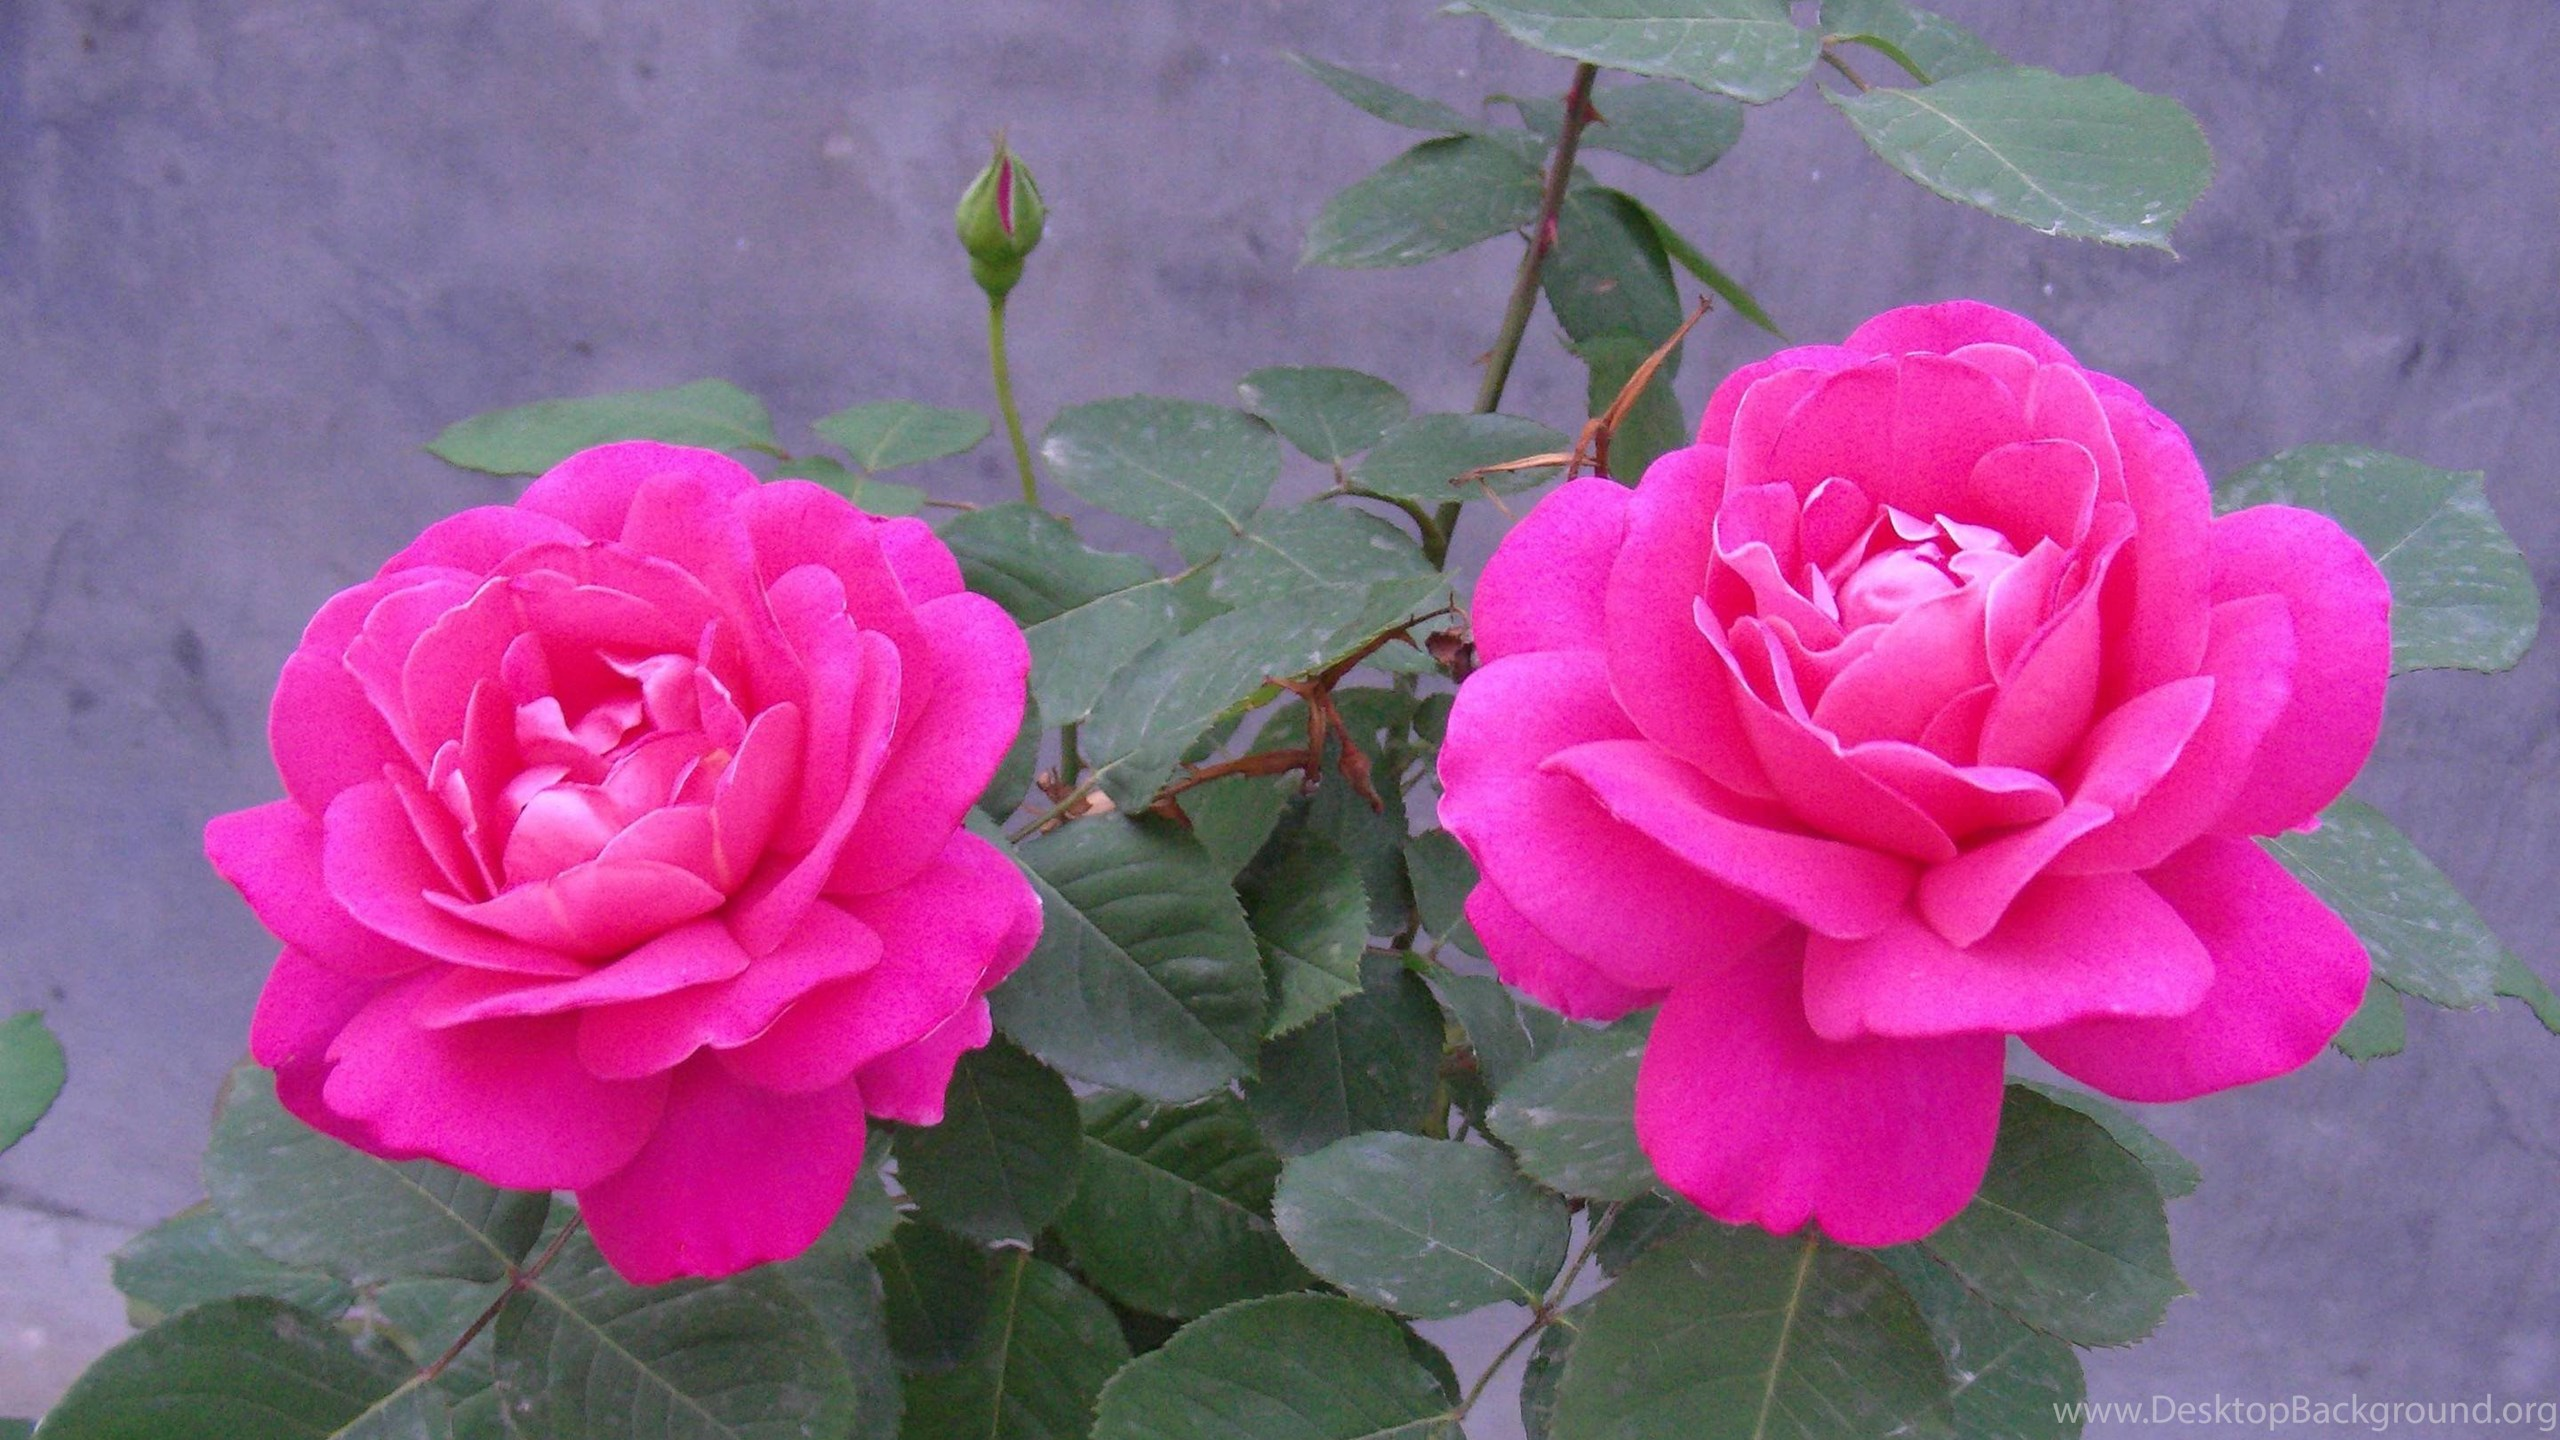 Rose Flower Wallpapers Hd Wallpapers Cave Desktop Background